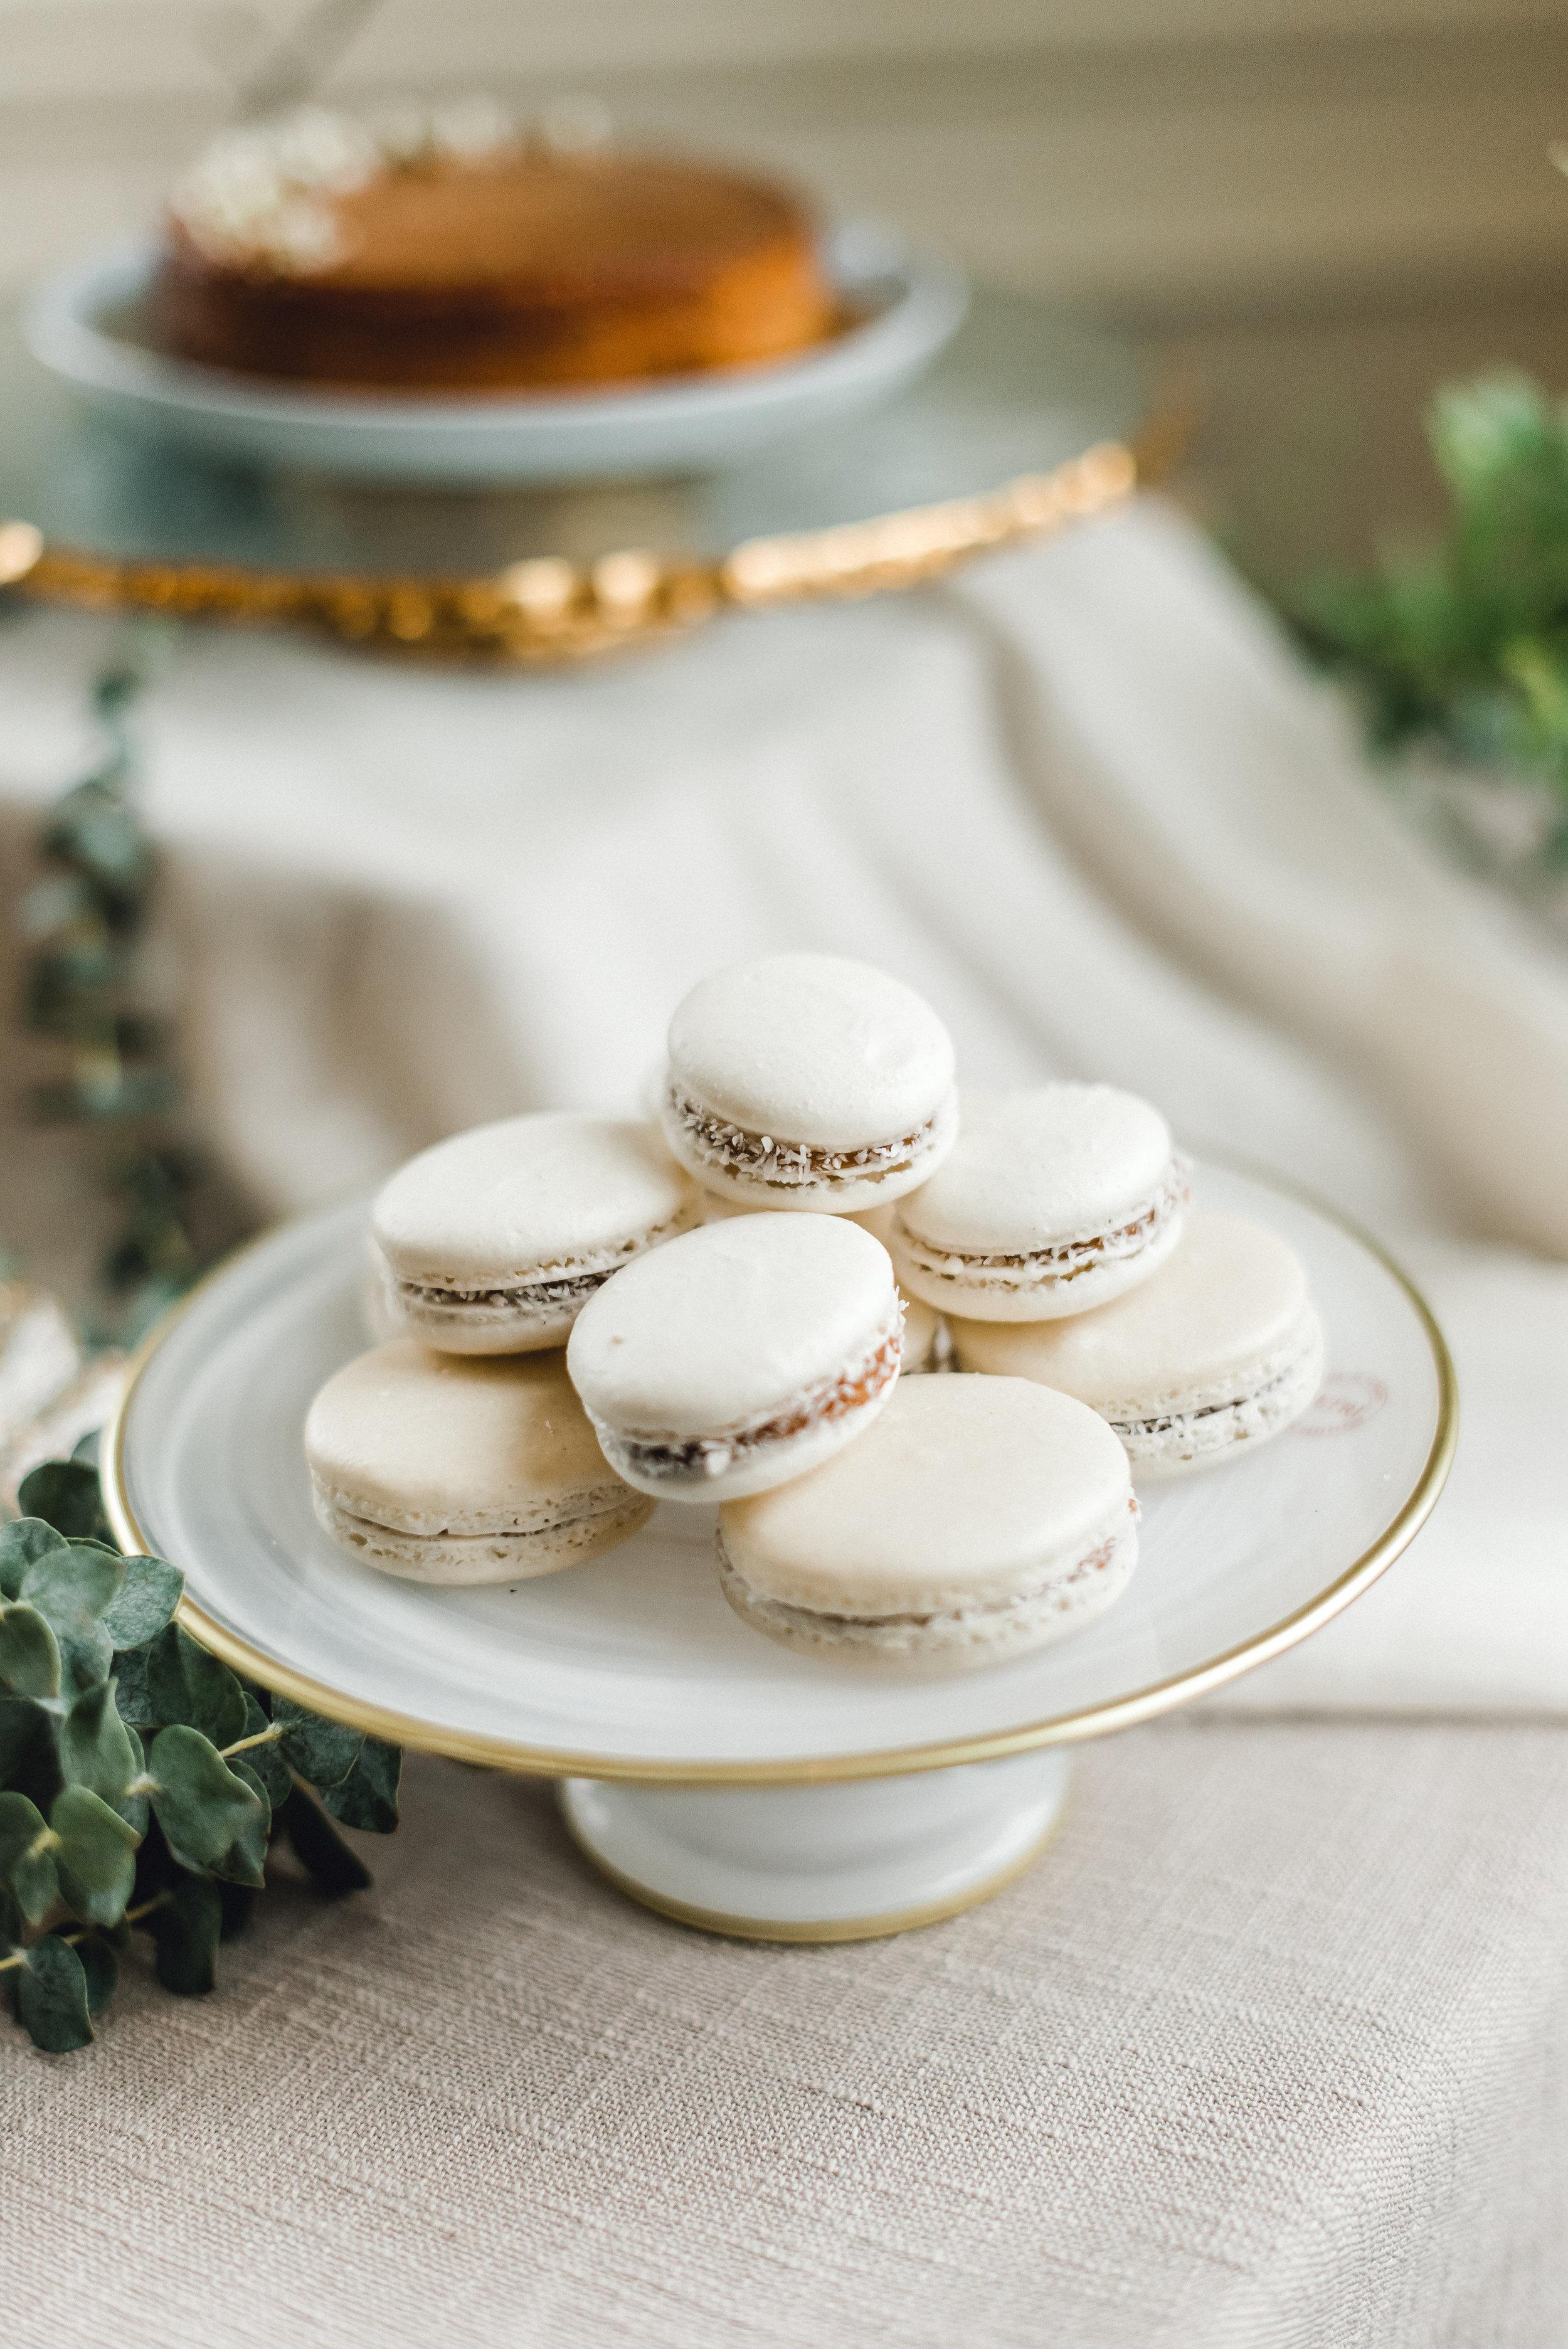 Pittsburgh-Wedding-Dessert-Table-K-Flowers-Designs.jpg